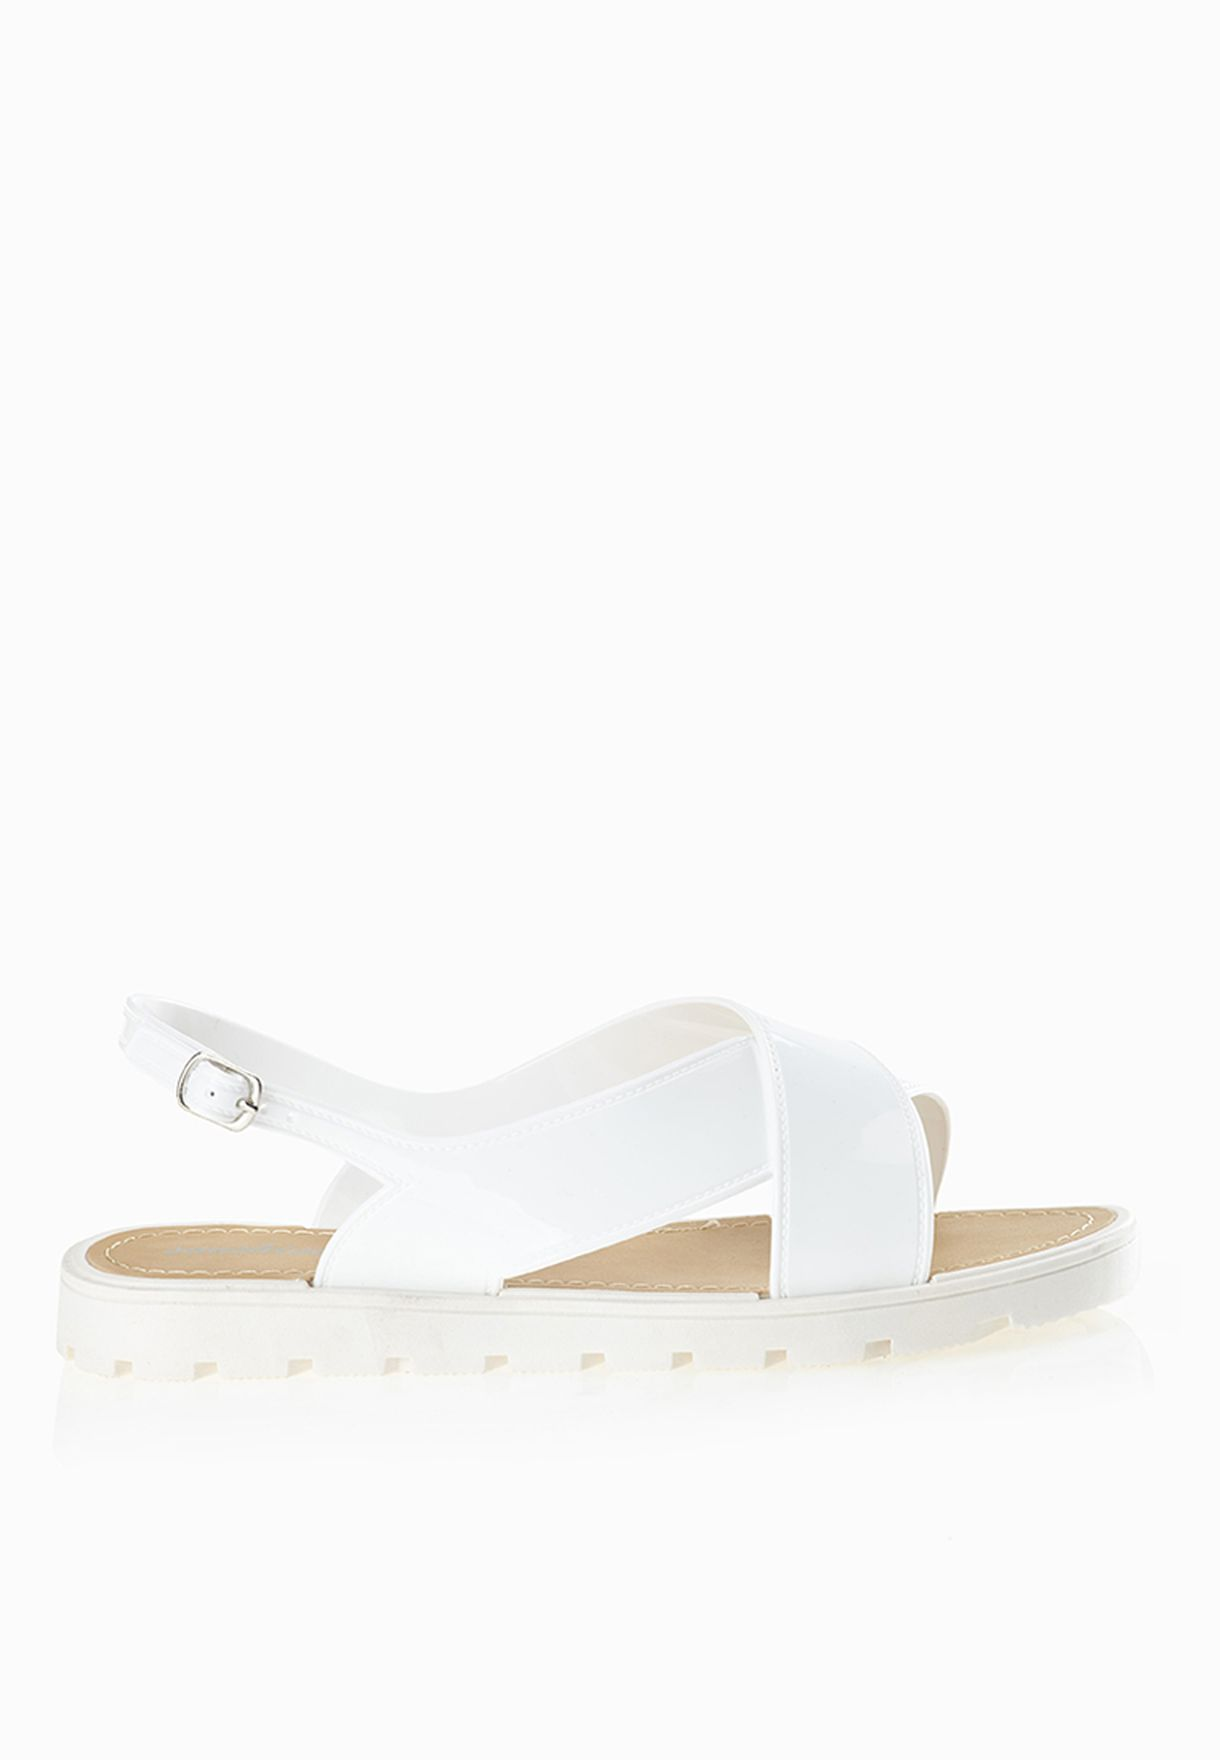 fd0e1549d1e3 Shop Sunshine white Cross Strap Jelly Sandals for Women in Oman ...